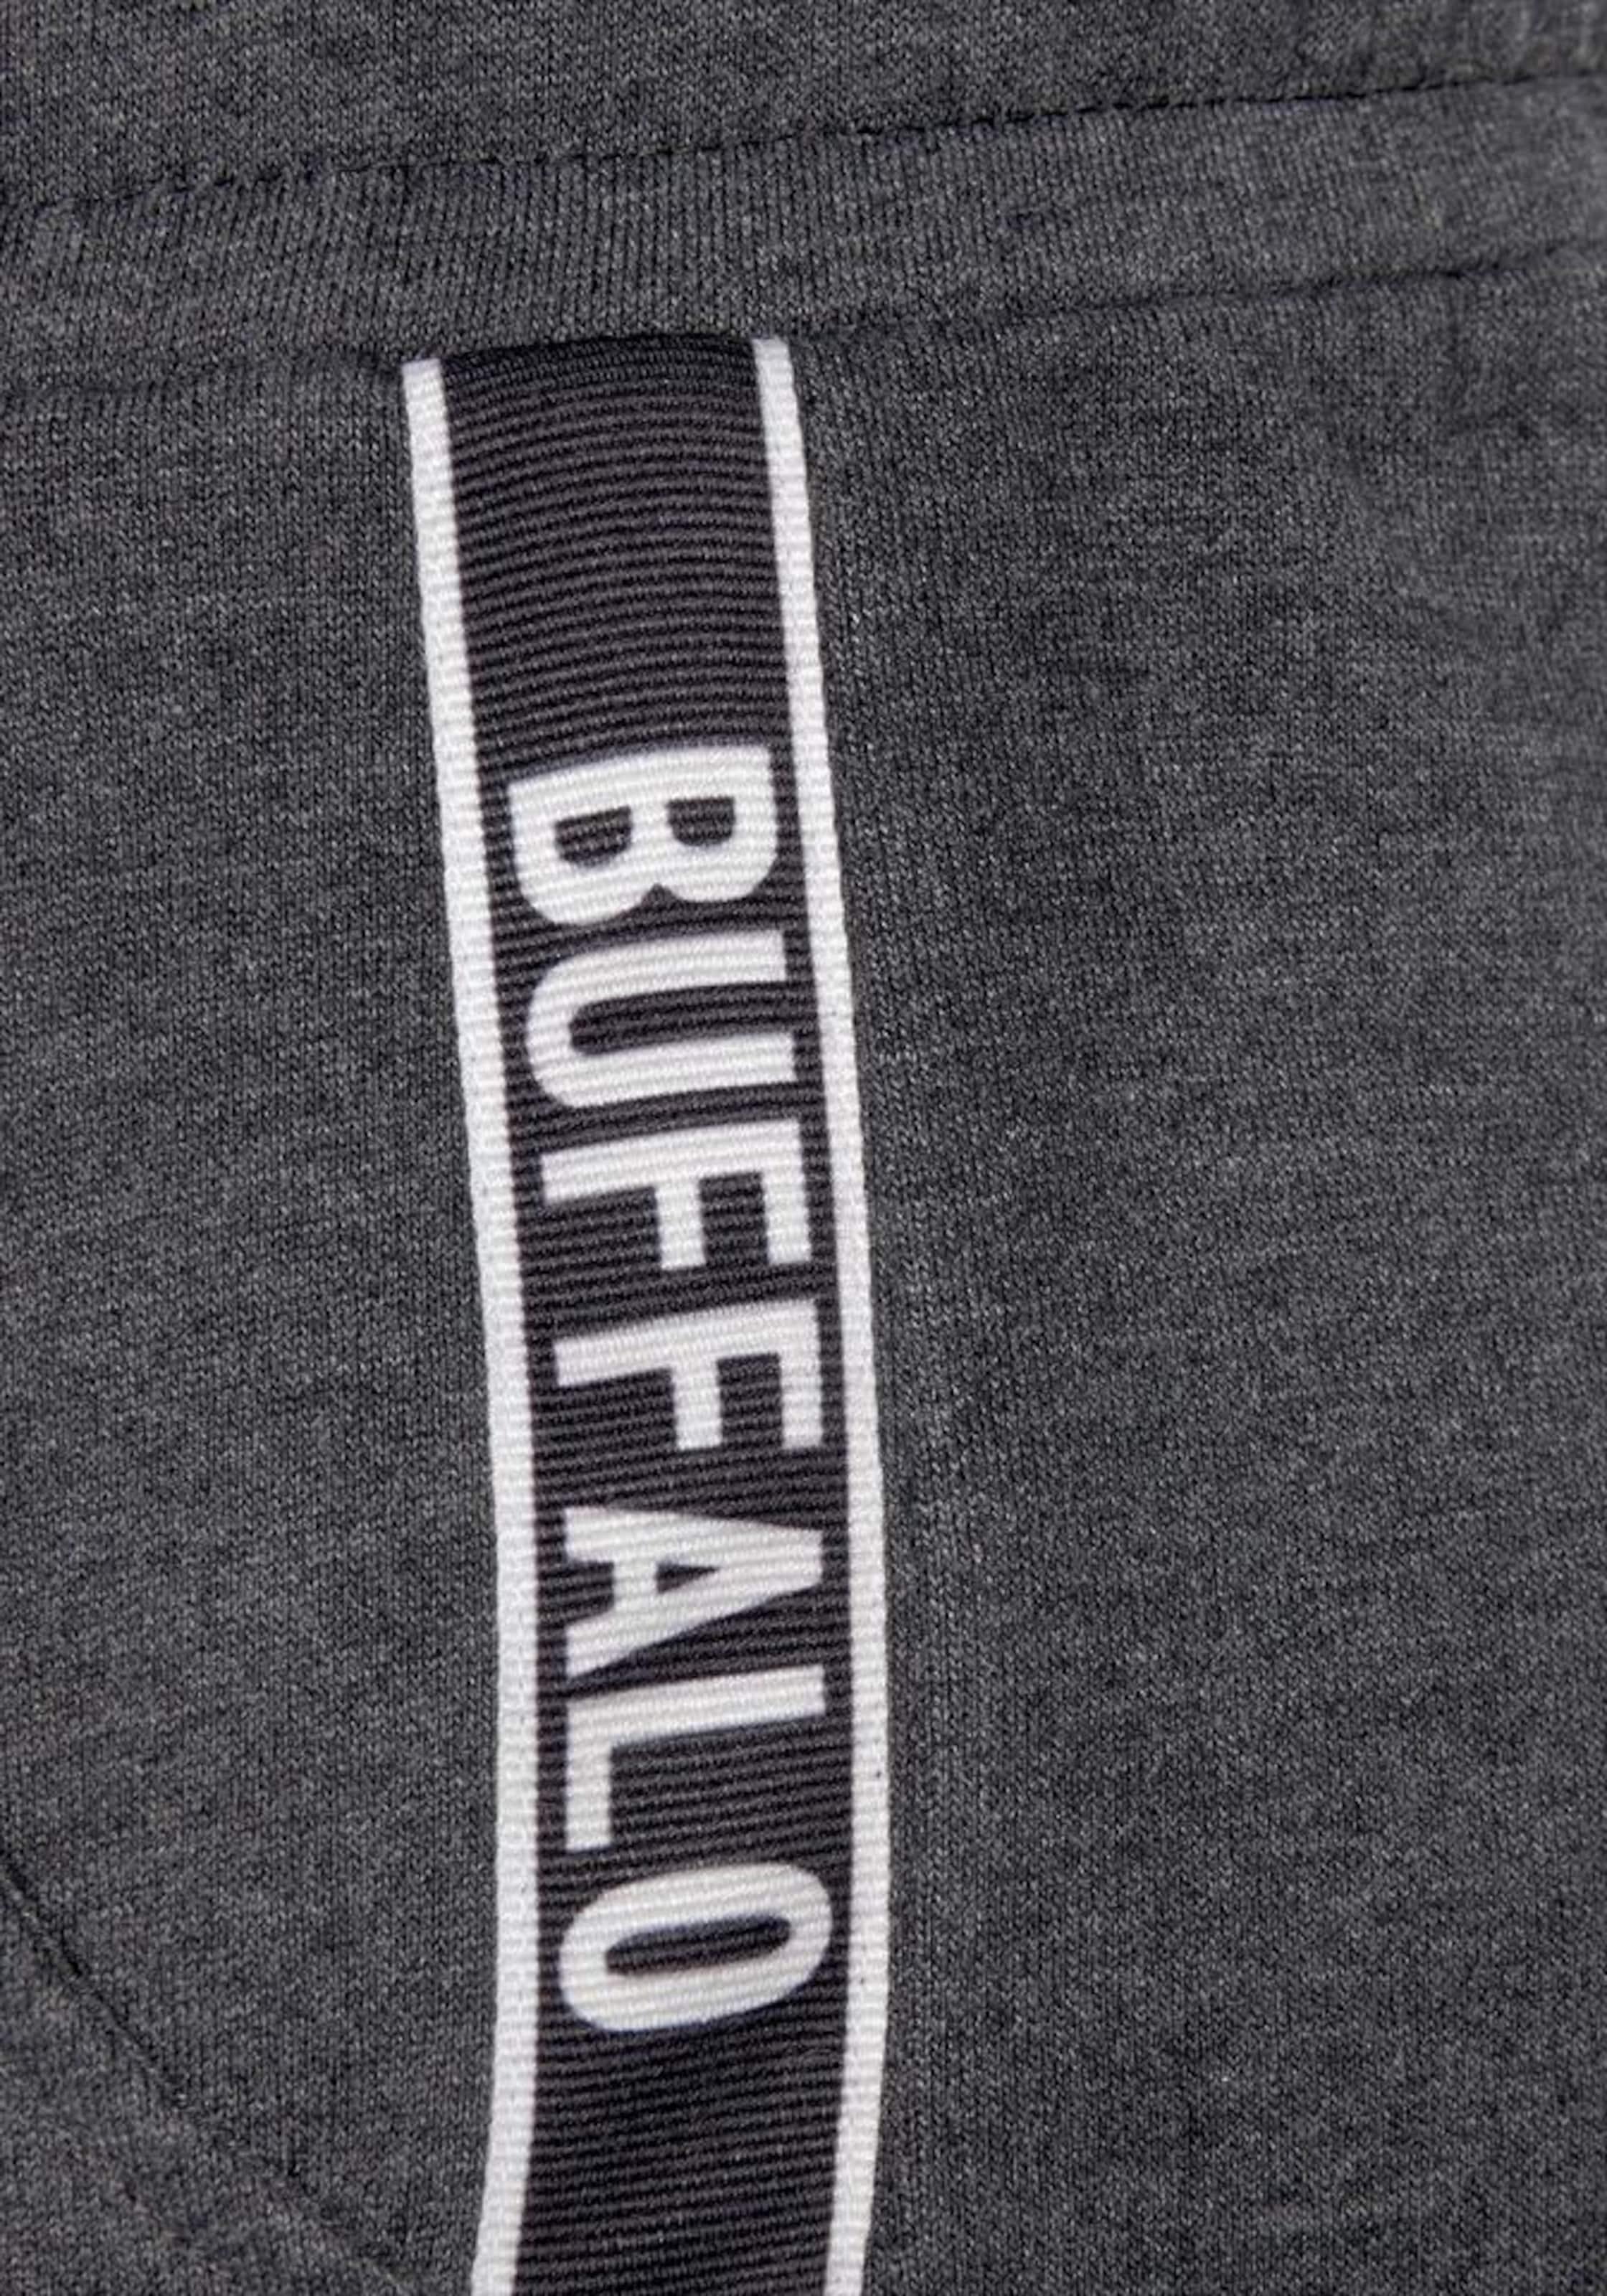 Sweatshorts In Buffalo SchwarzmeliertWeiß Sweatshorts Buffalo SchwarzmeliertWeiß Buffalo In 0m8vOwyNn